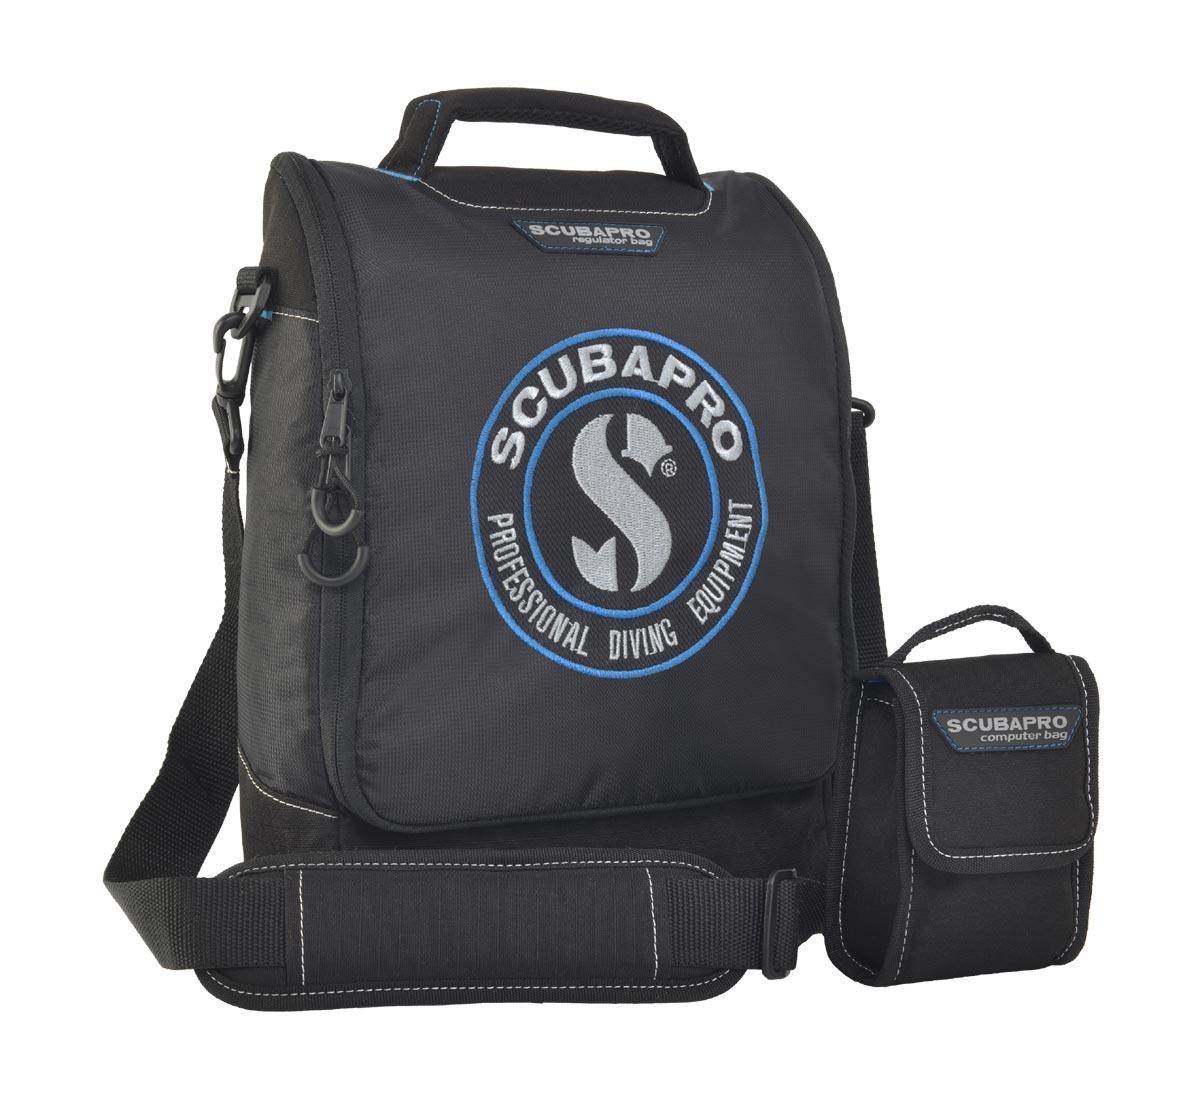 Комплект от 2 чанти за водолазни регулатори и за водолазен компютър - Scubapro